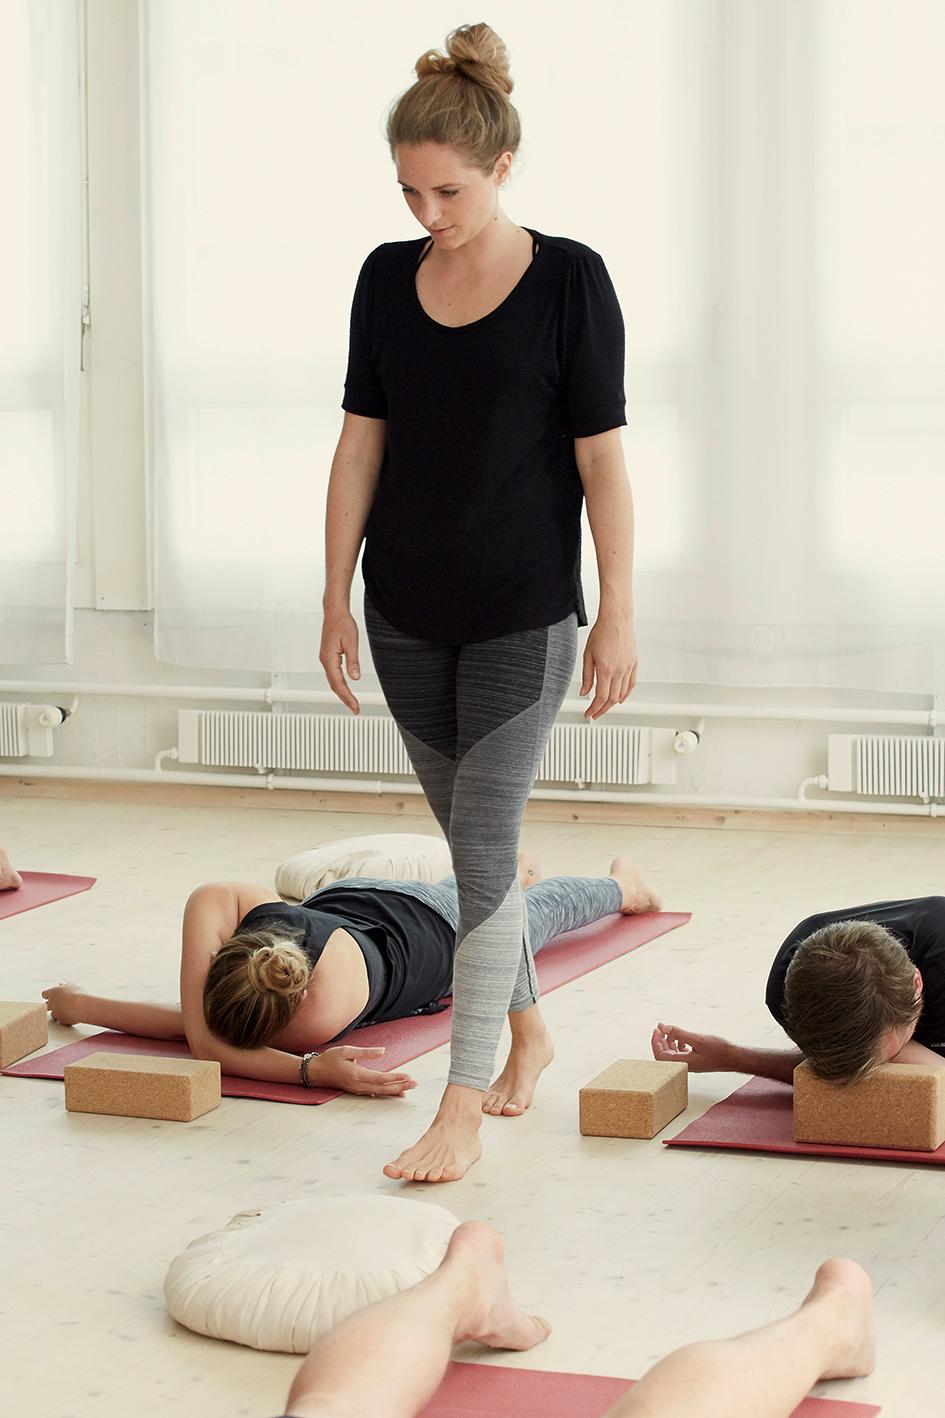 LINKS - Yoga3 StudioSommeryoga FrauenbadiTheresa MoserAnita FaesDhugal MeachemYin YogaPaul Grilley